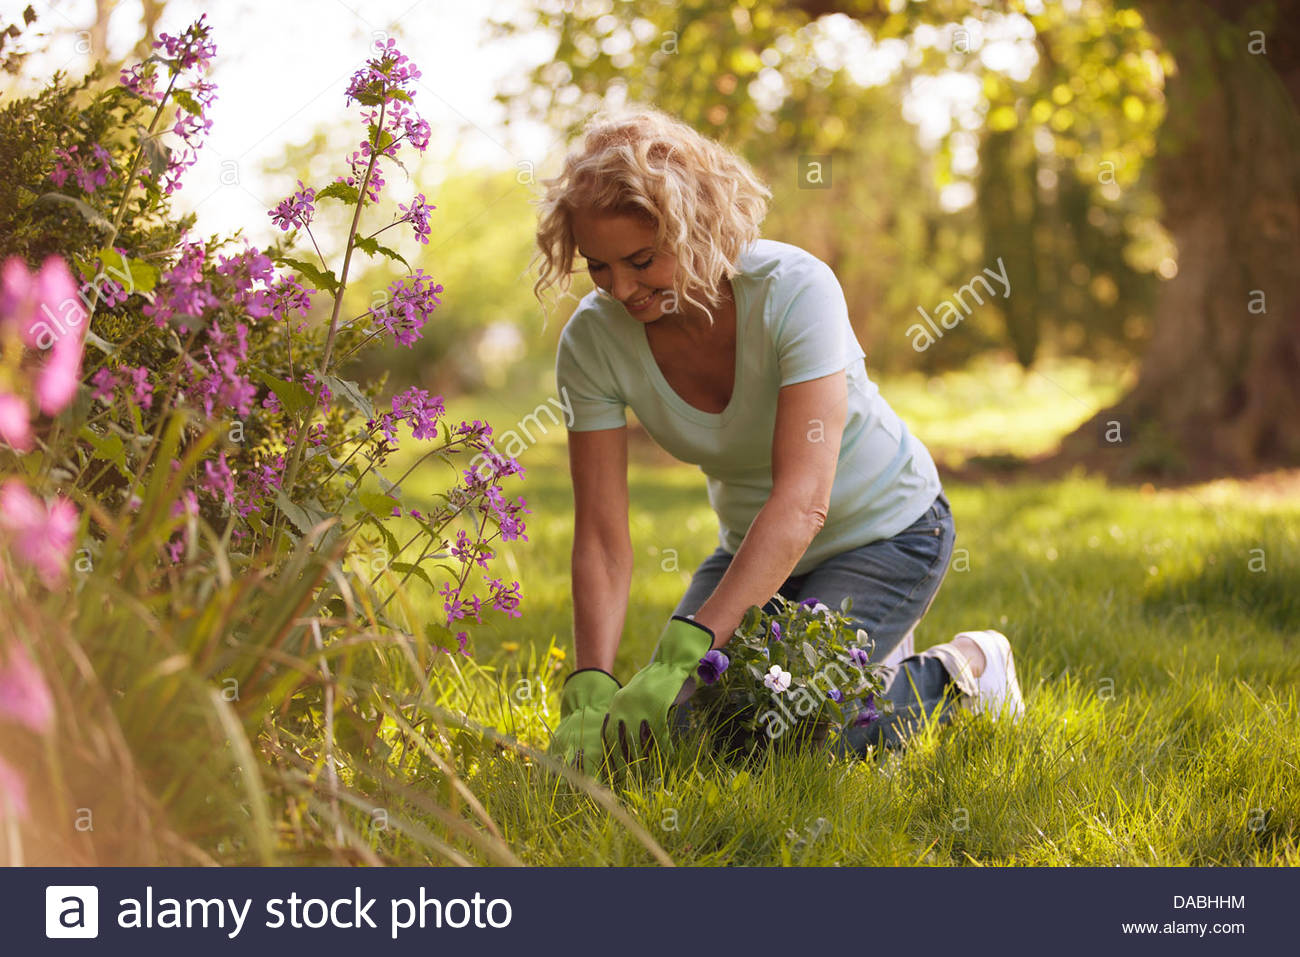 A mature woman gardening Photo Stock